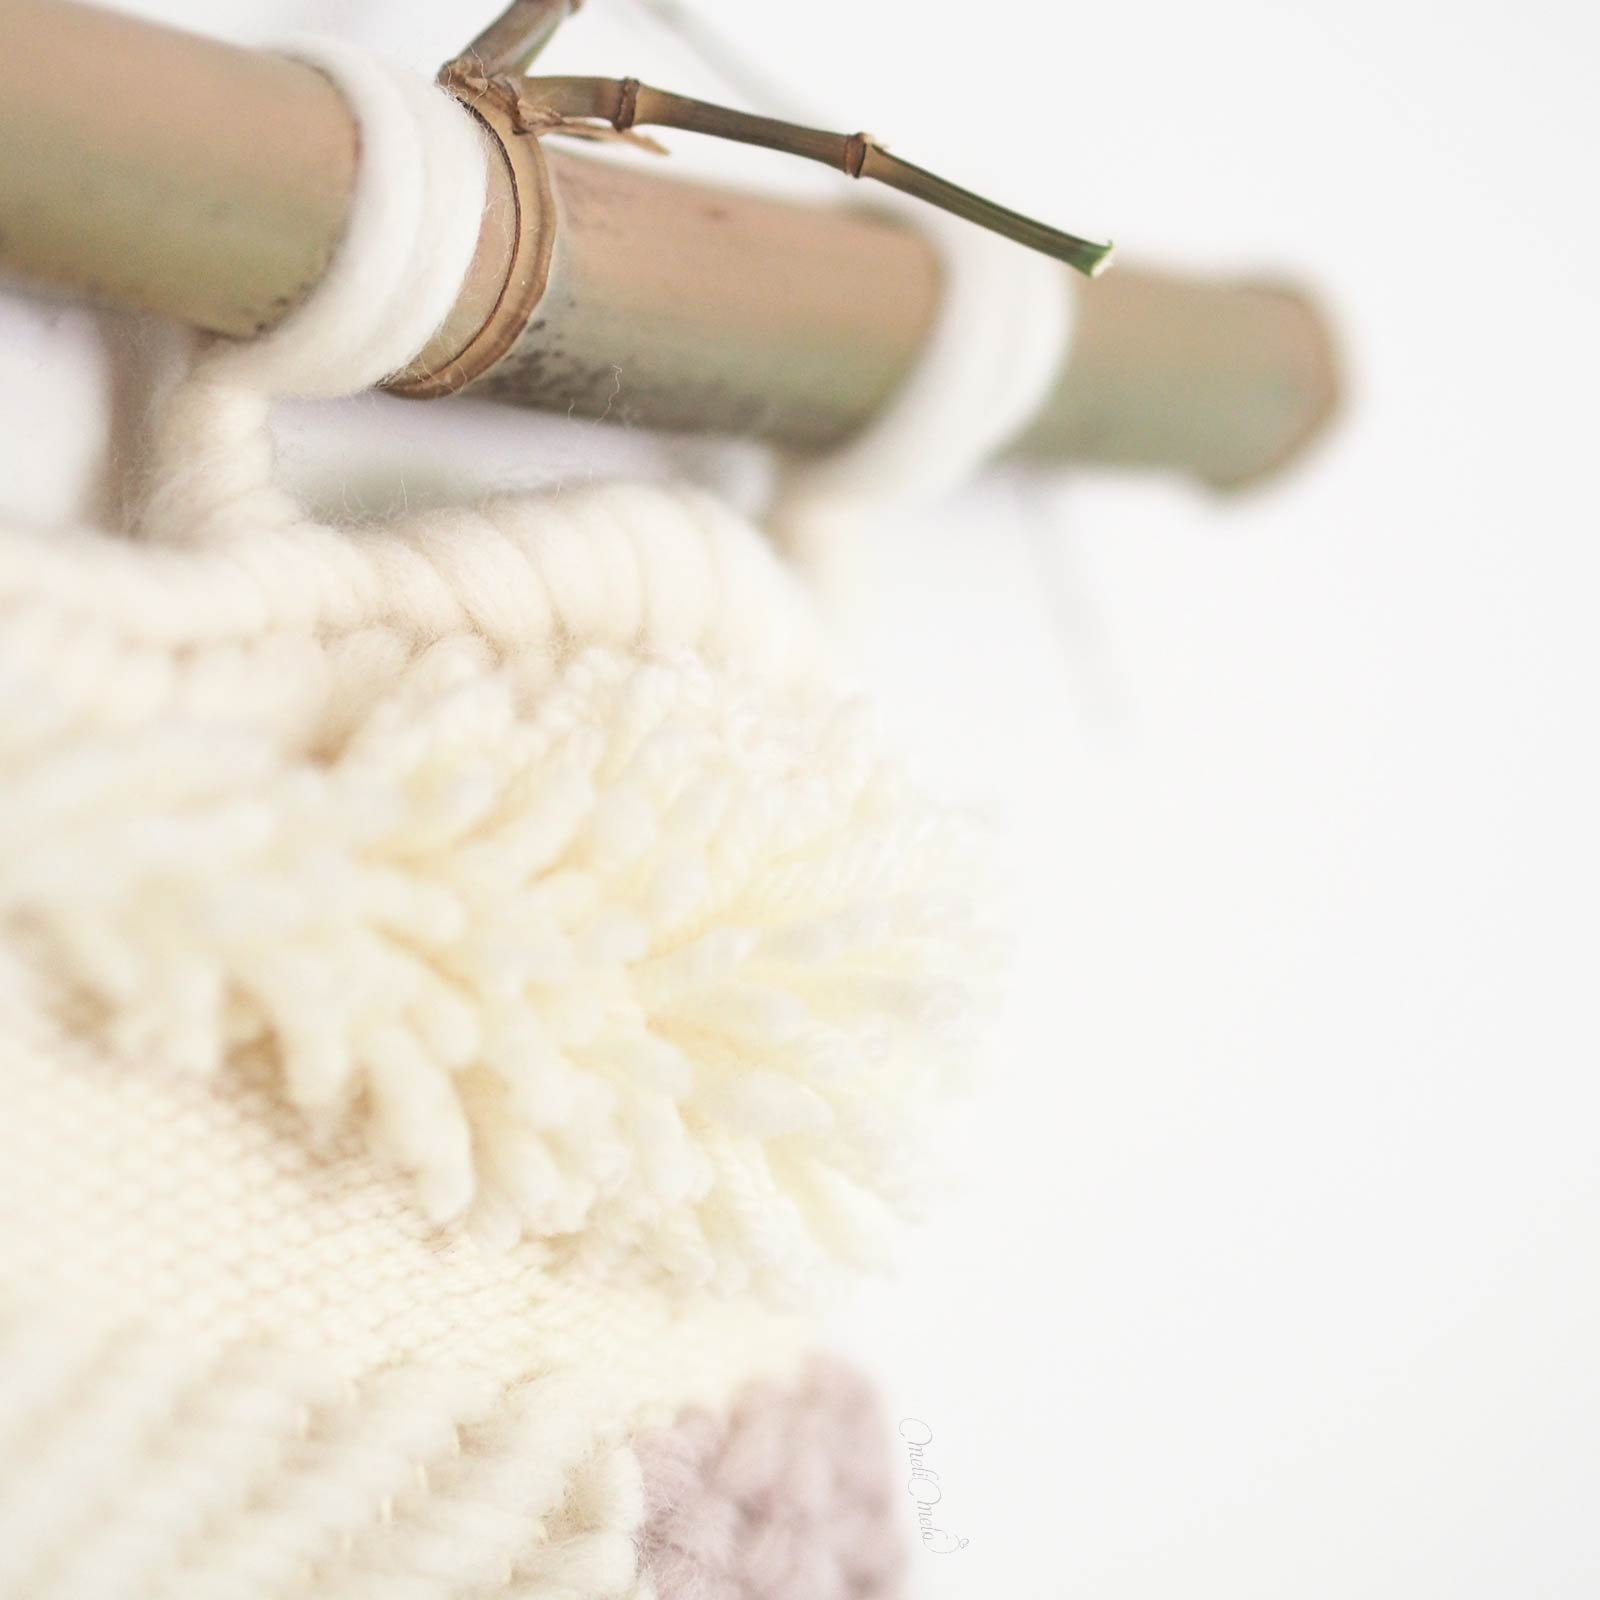 tissage laine cuivre bambou laboutiquedemelimelo